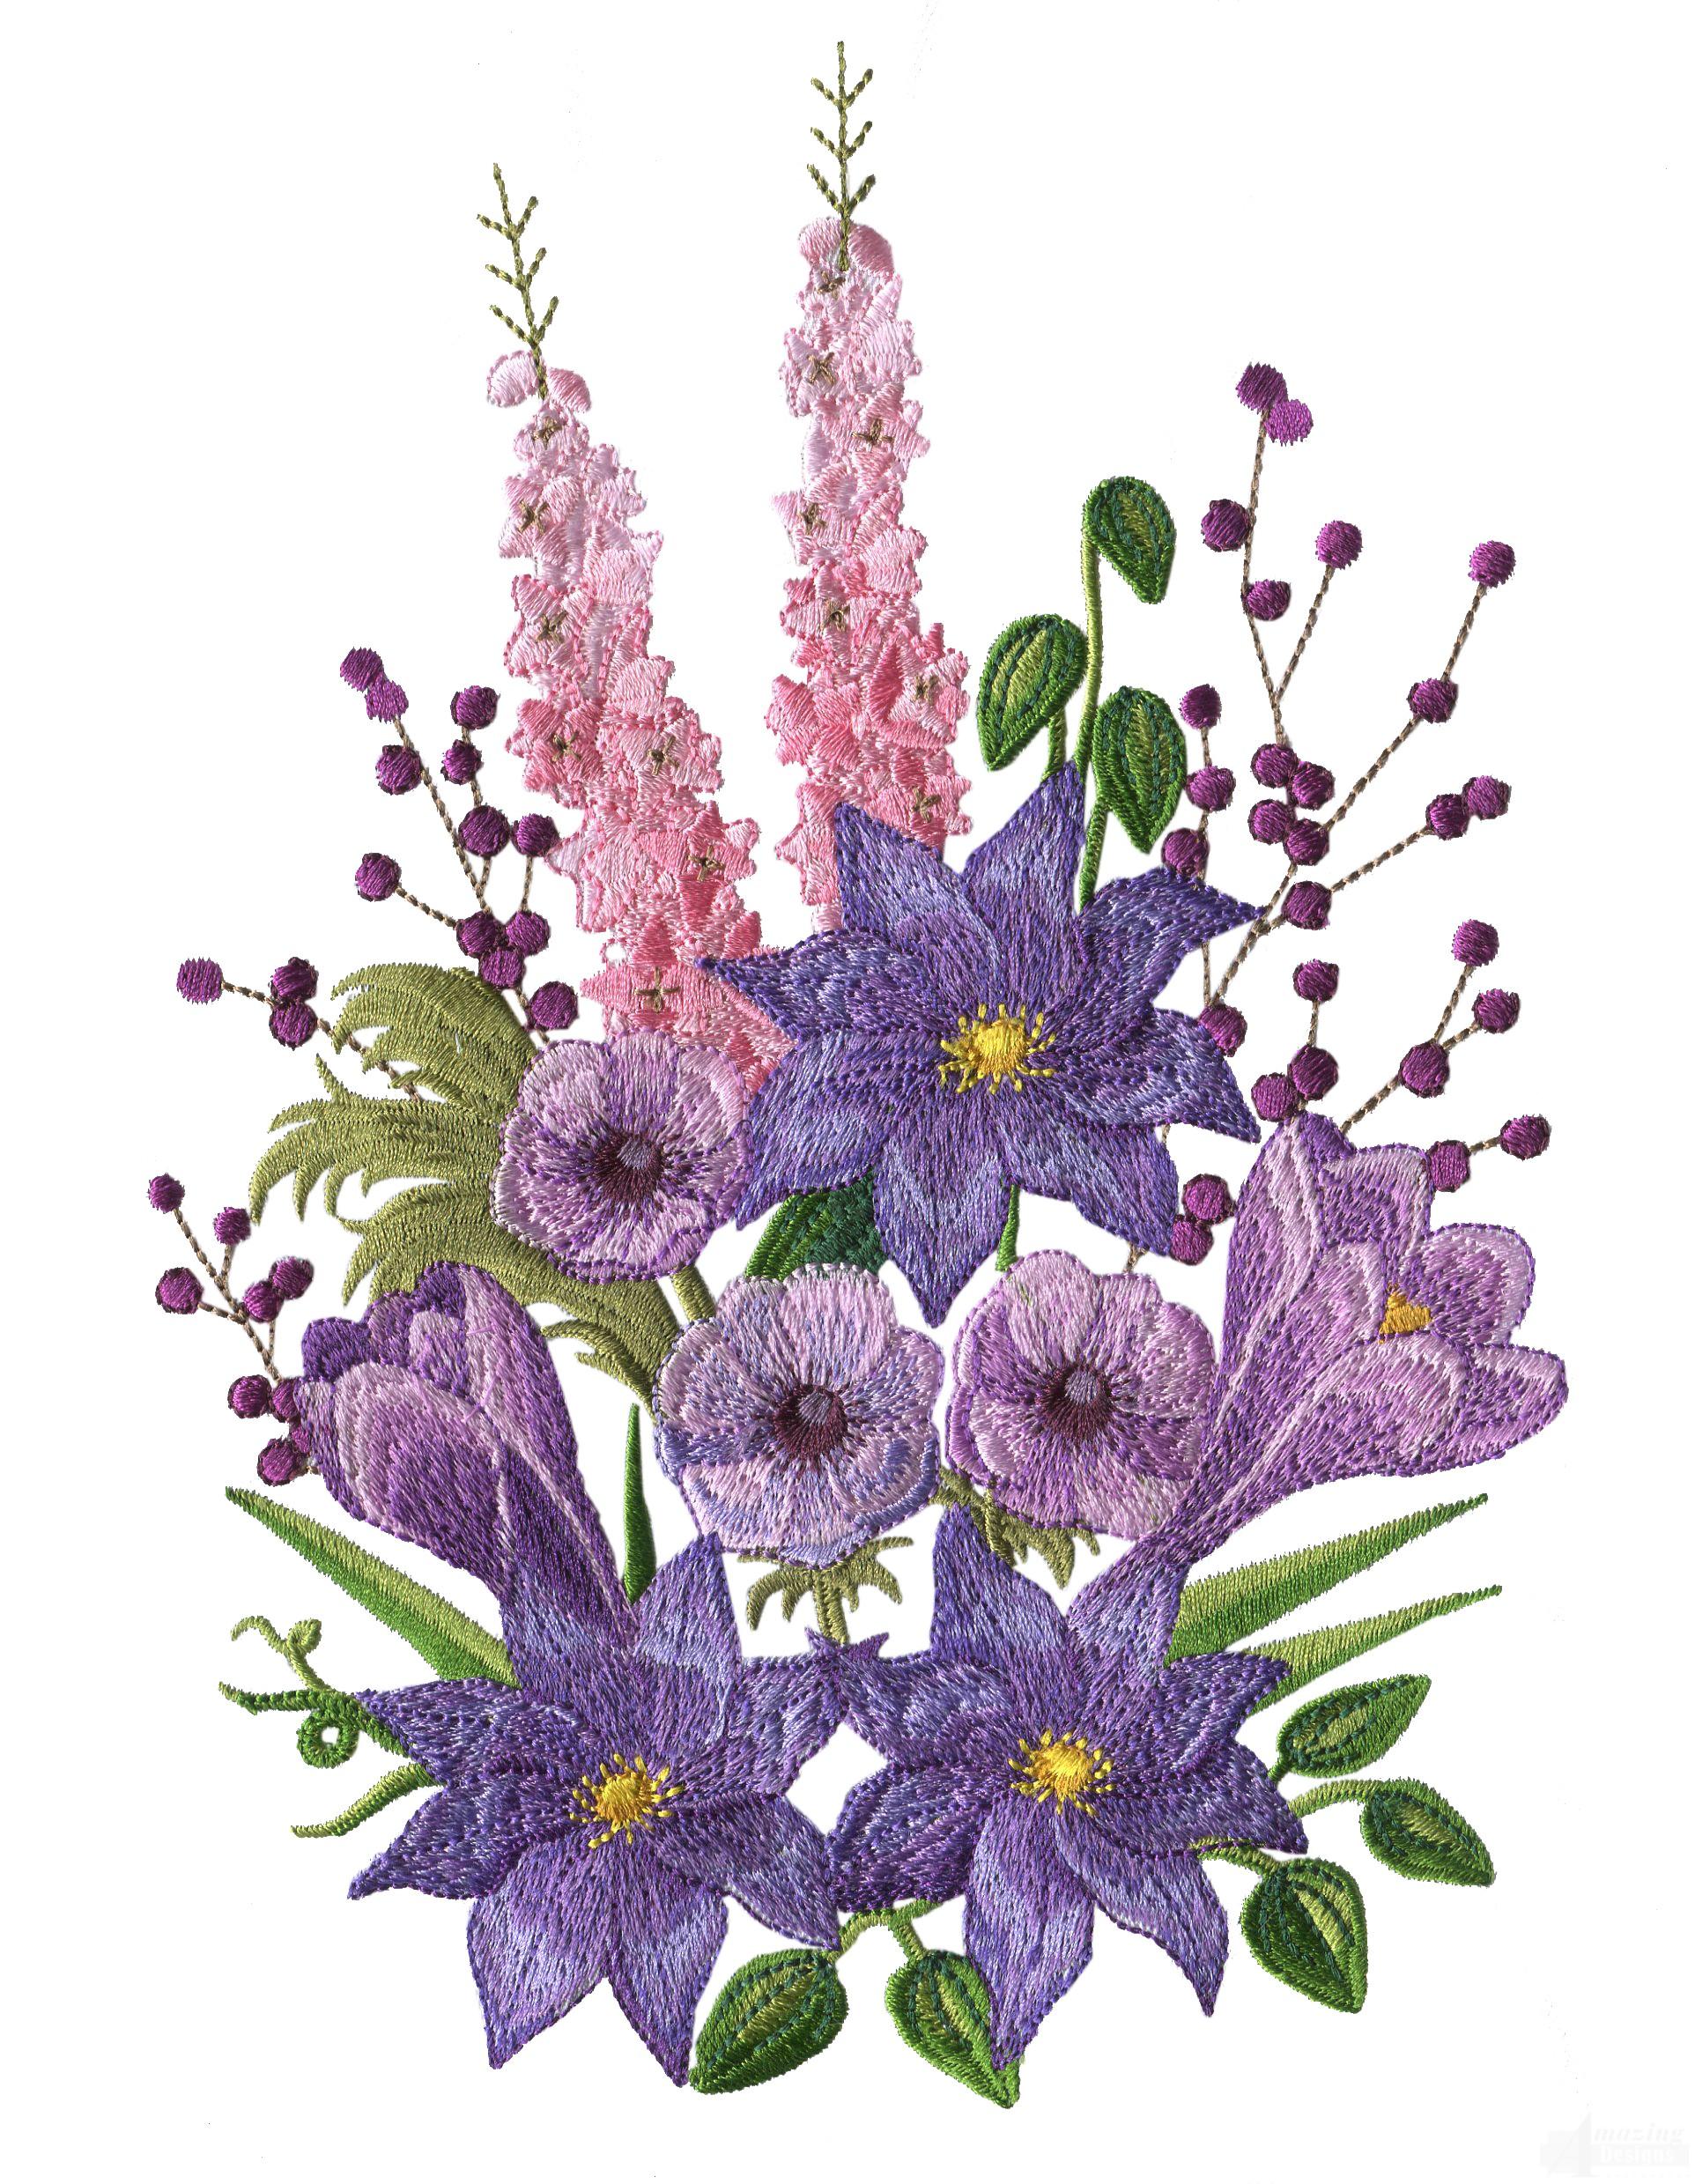 Swnfl flourishing flowers embroidery design